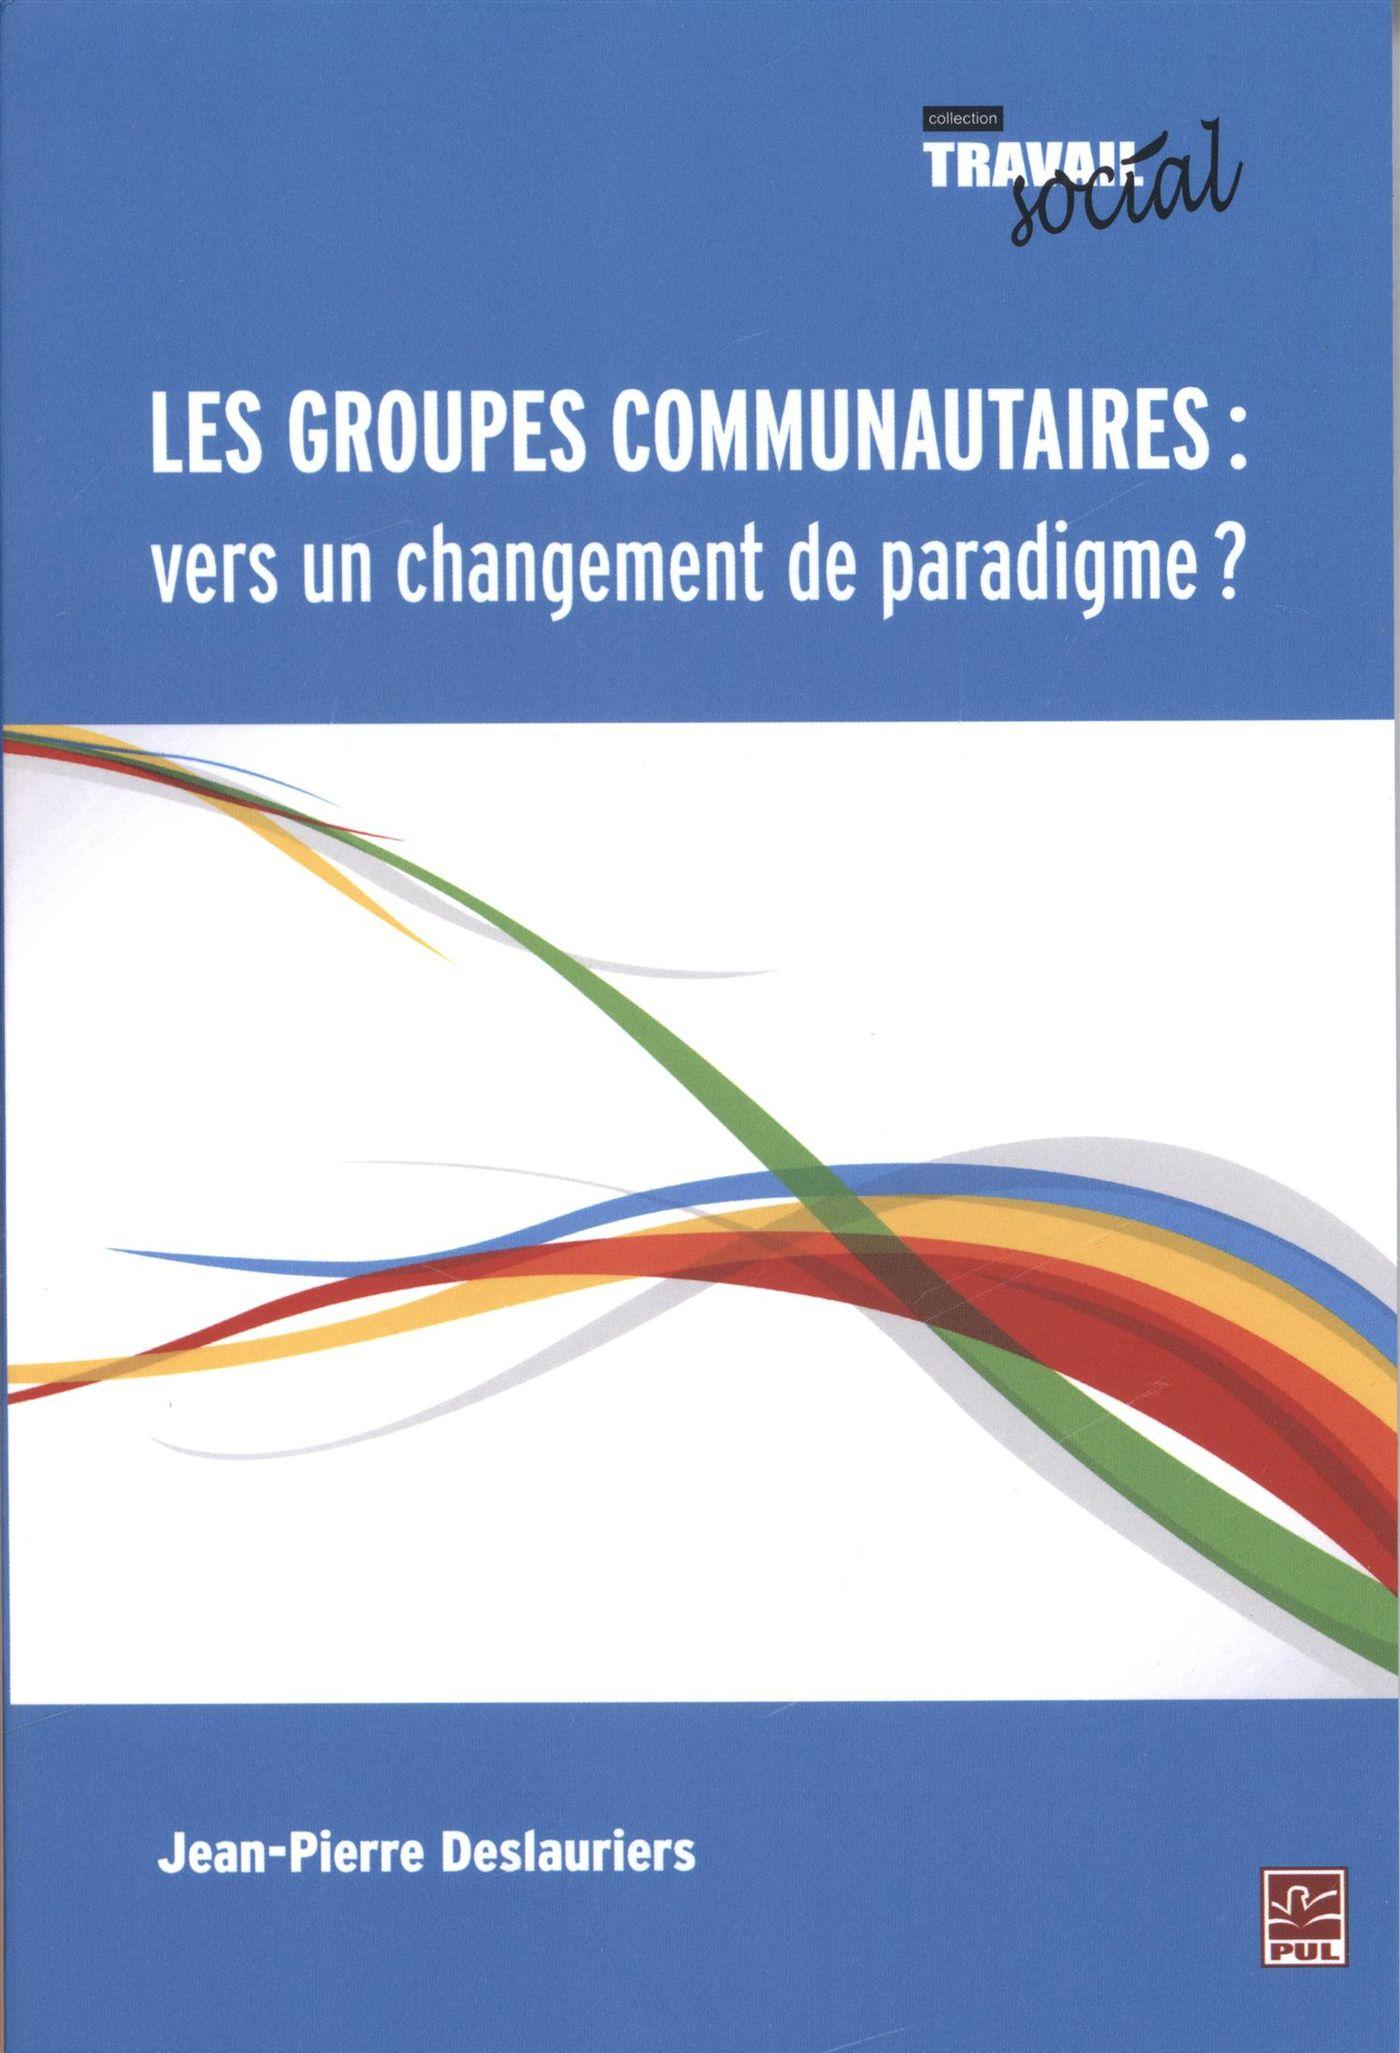 Les groupes communautaires